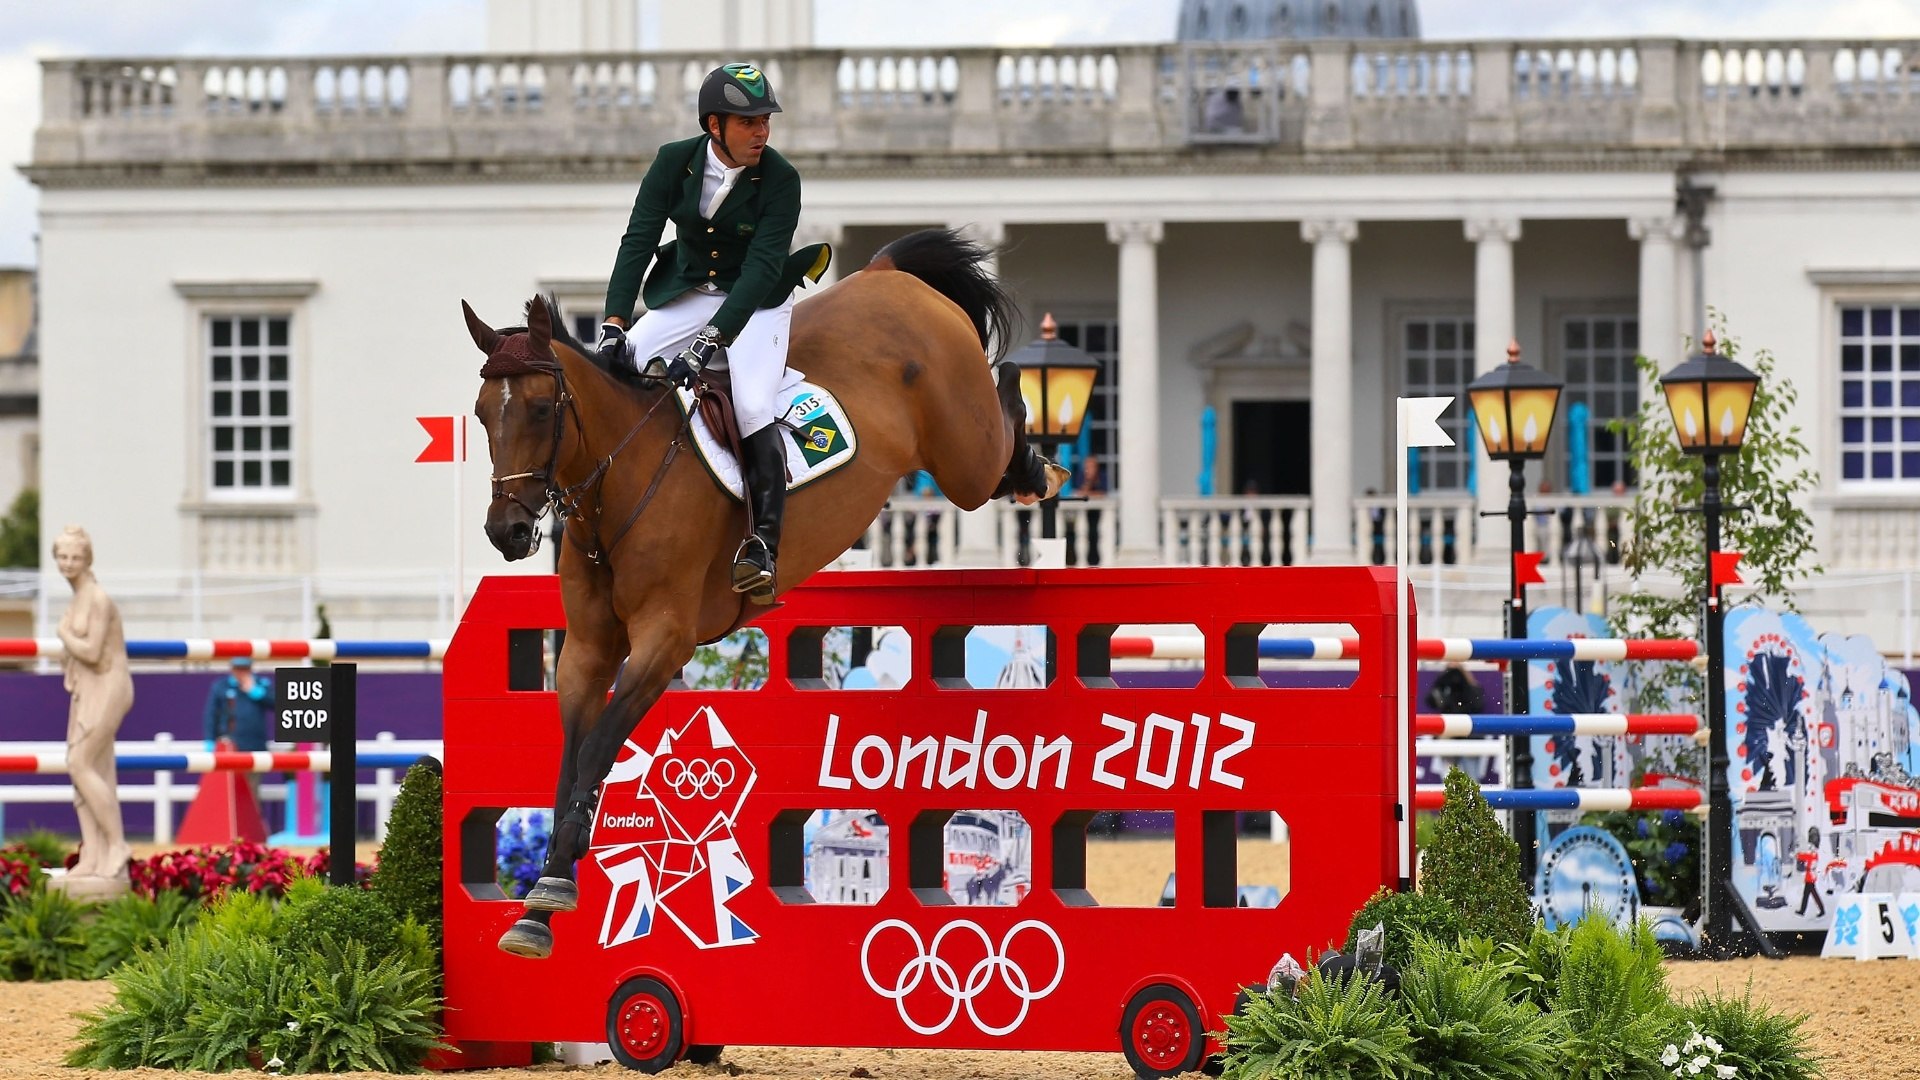 Álvaro Miranda, o Doda, salta sob obstáculo em formato dos ônibus de Londres durante a prova de saltos do hipismo